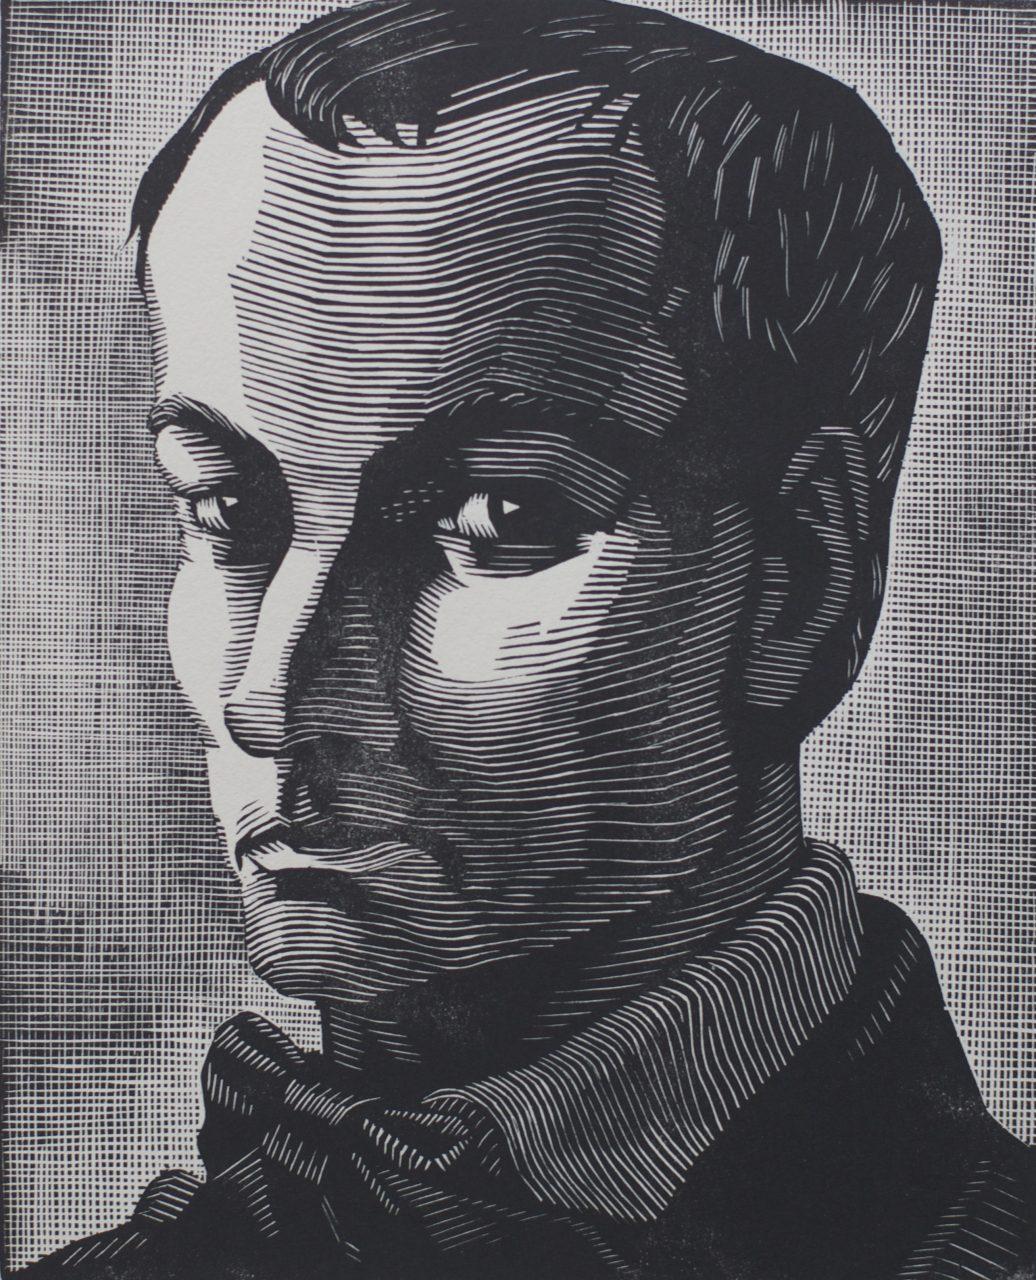 Victor Delhez Charles Baudelaire